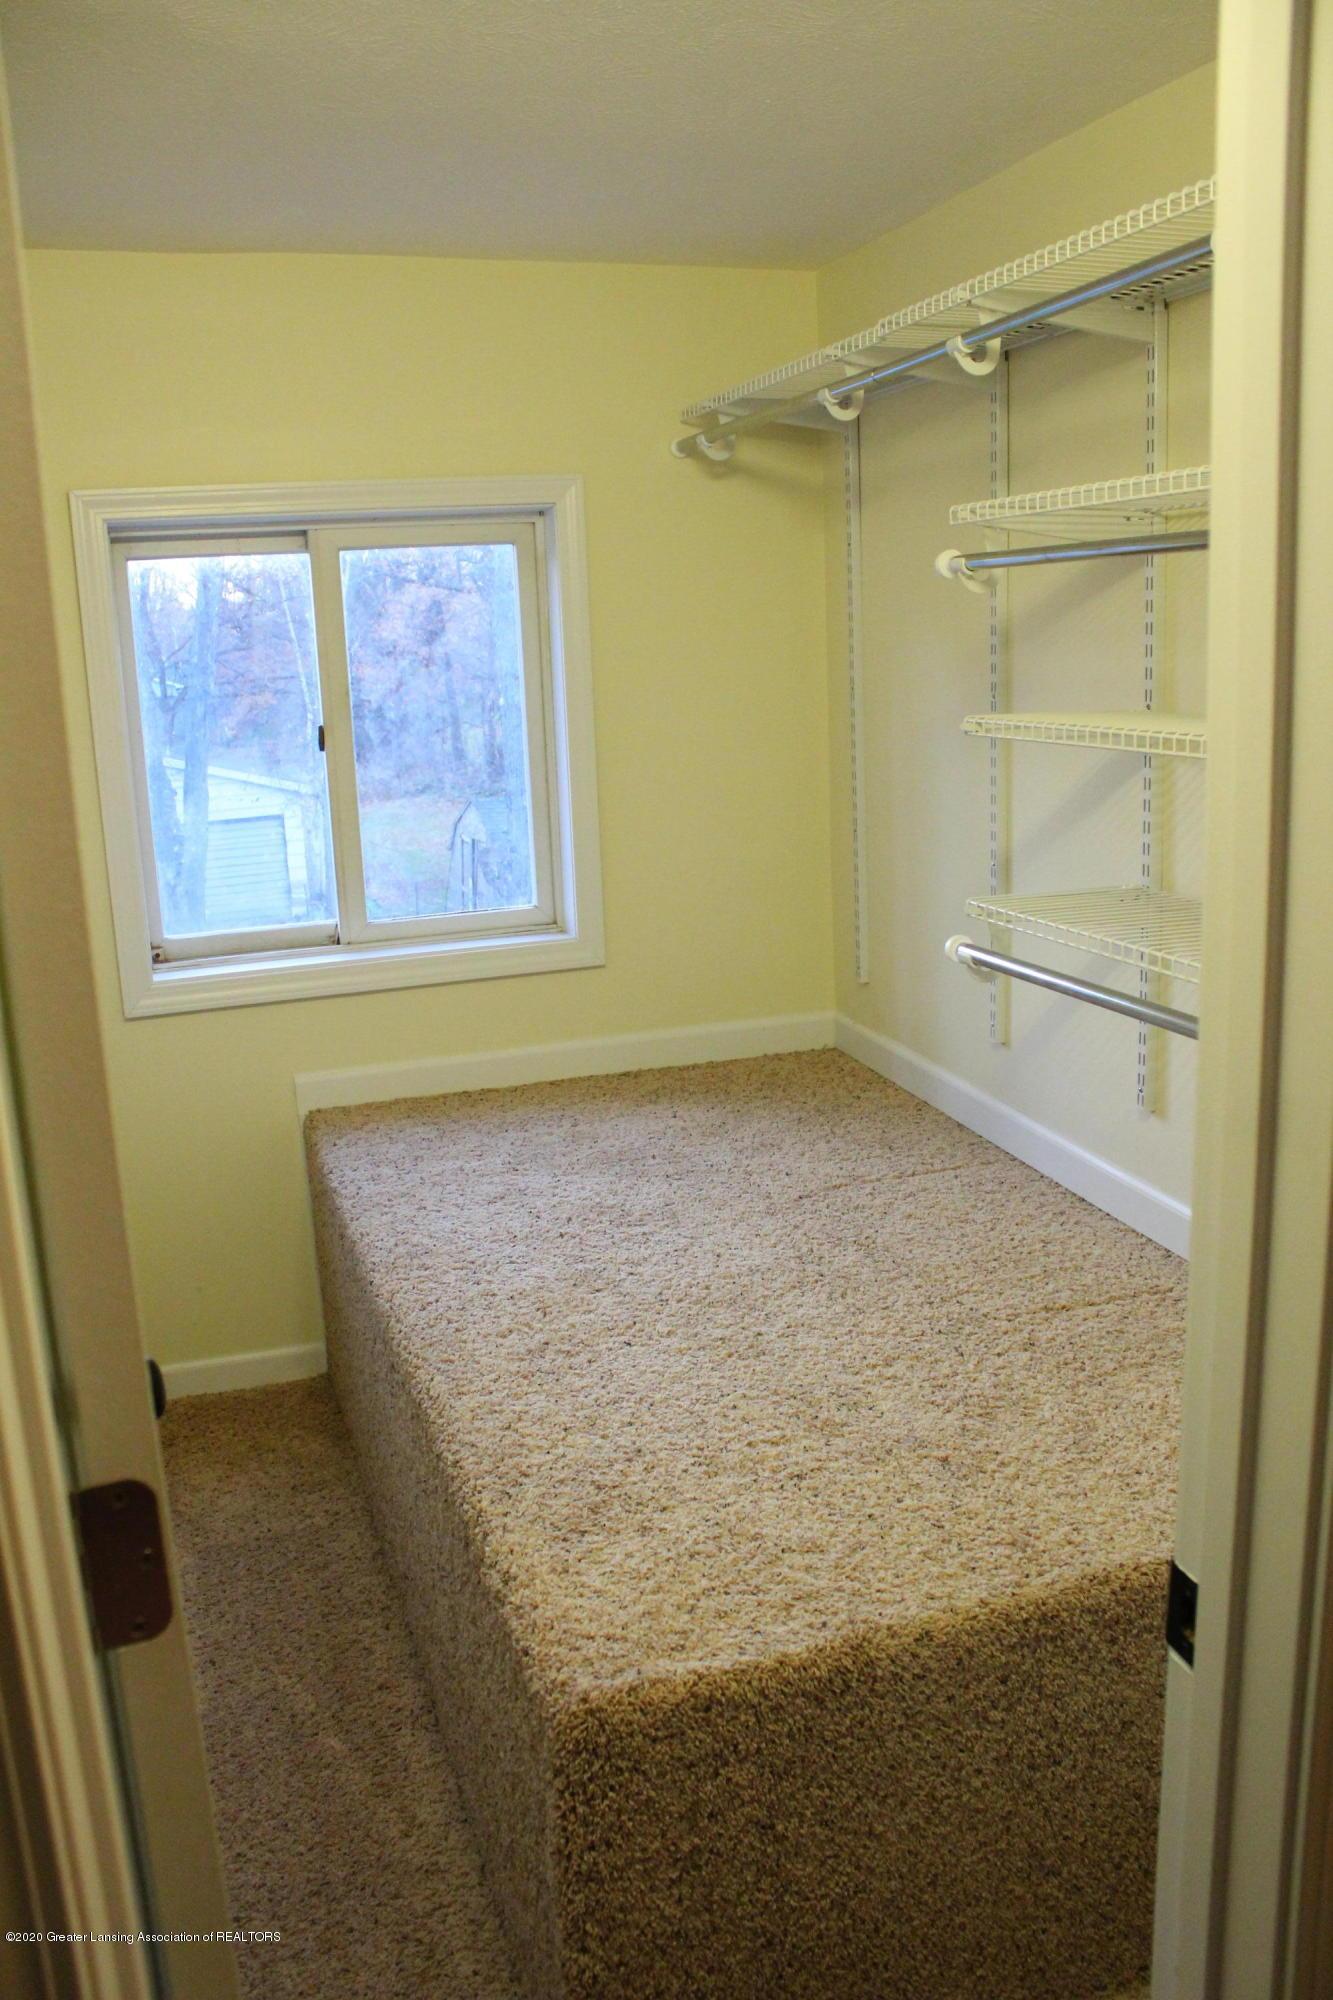 901 N Cochran Ave - 13 storage closet level 2 - 13